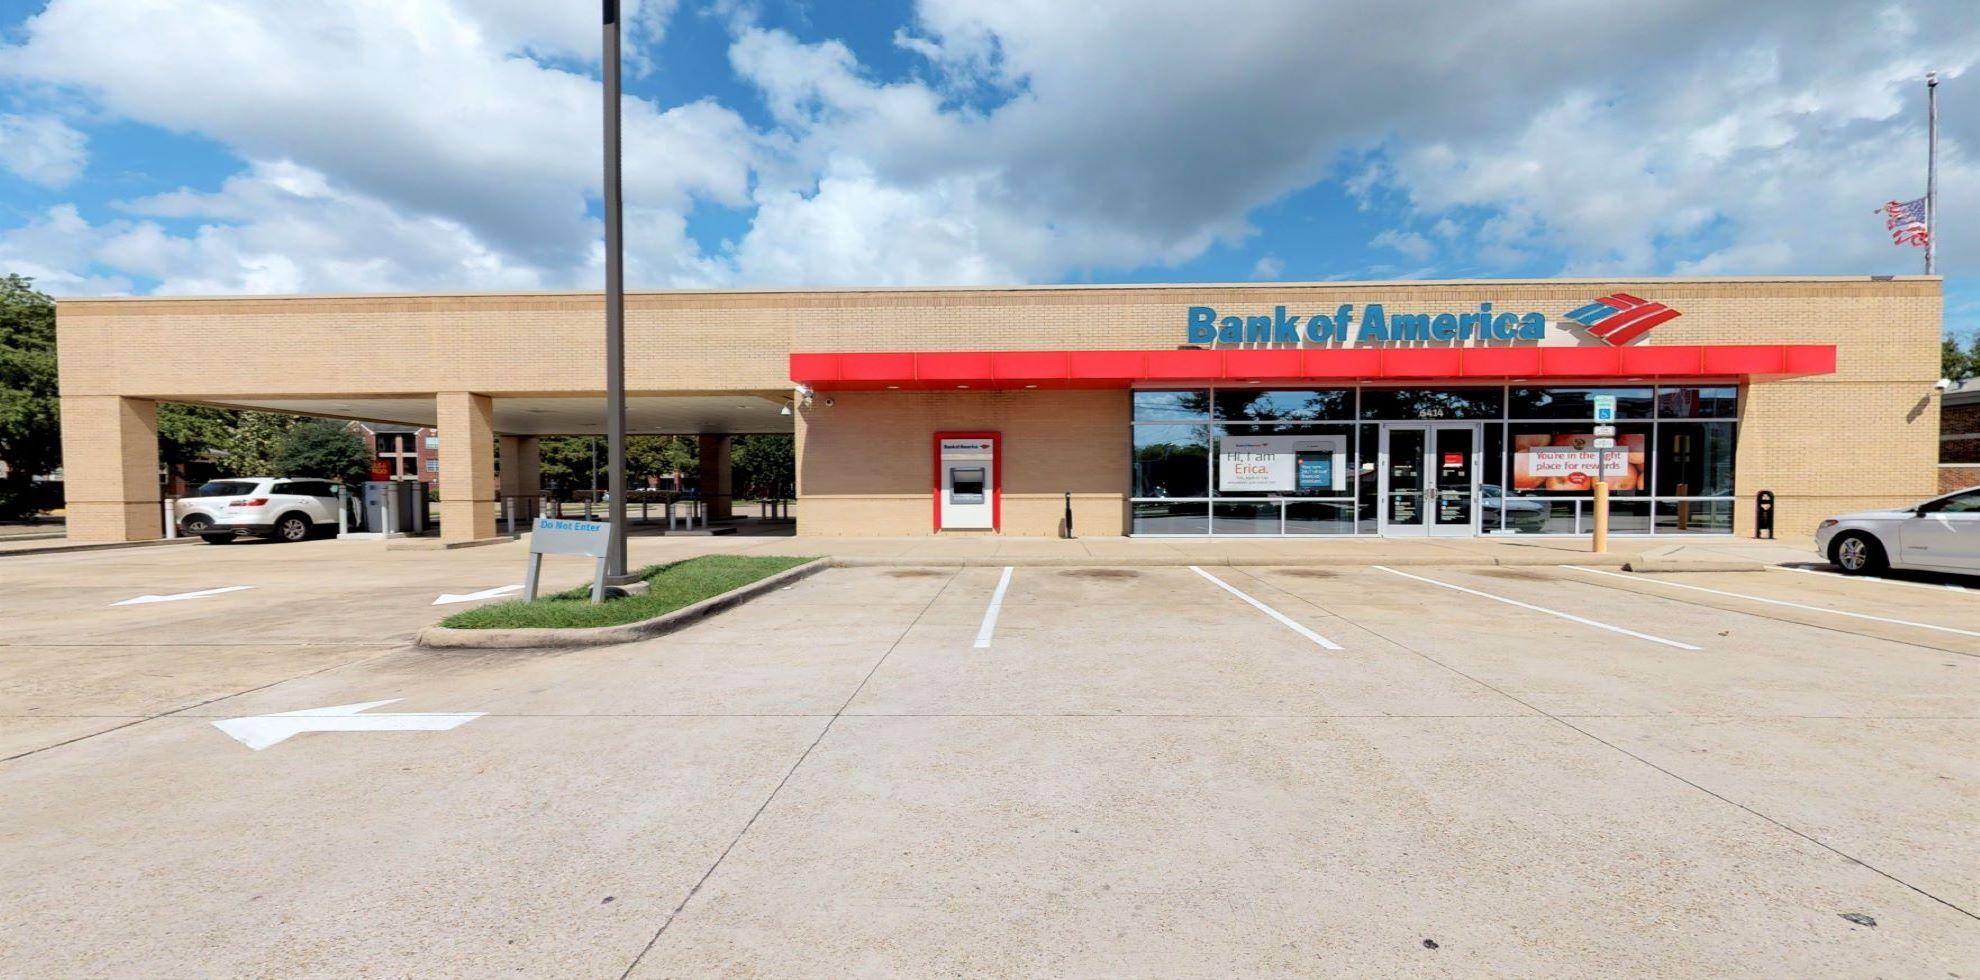 Bank of America financial center with drive-thru ATM | 6414 San Felipe St, Houston, TX 77057